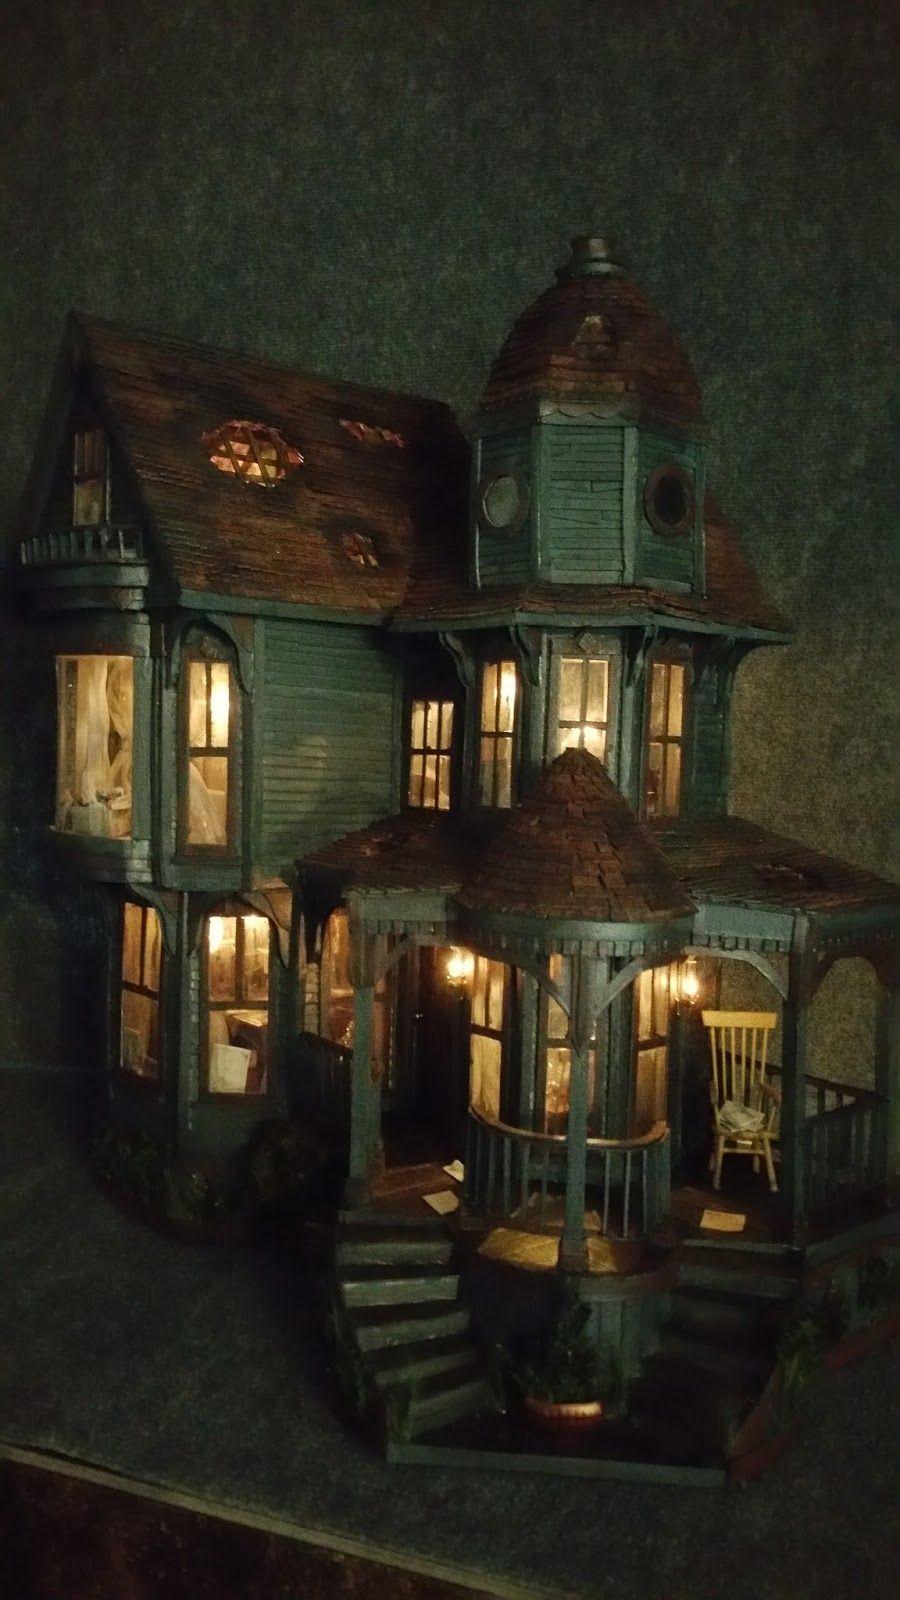 Greggs Miniature Imaginations: Haunted Mansion made out of Cardboard #haunteddollhouse